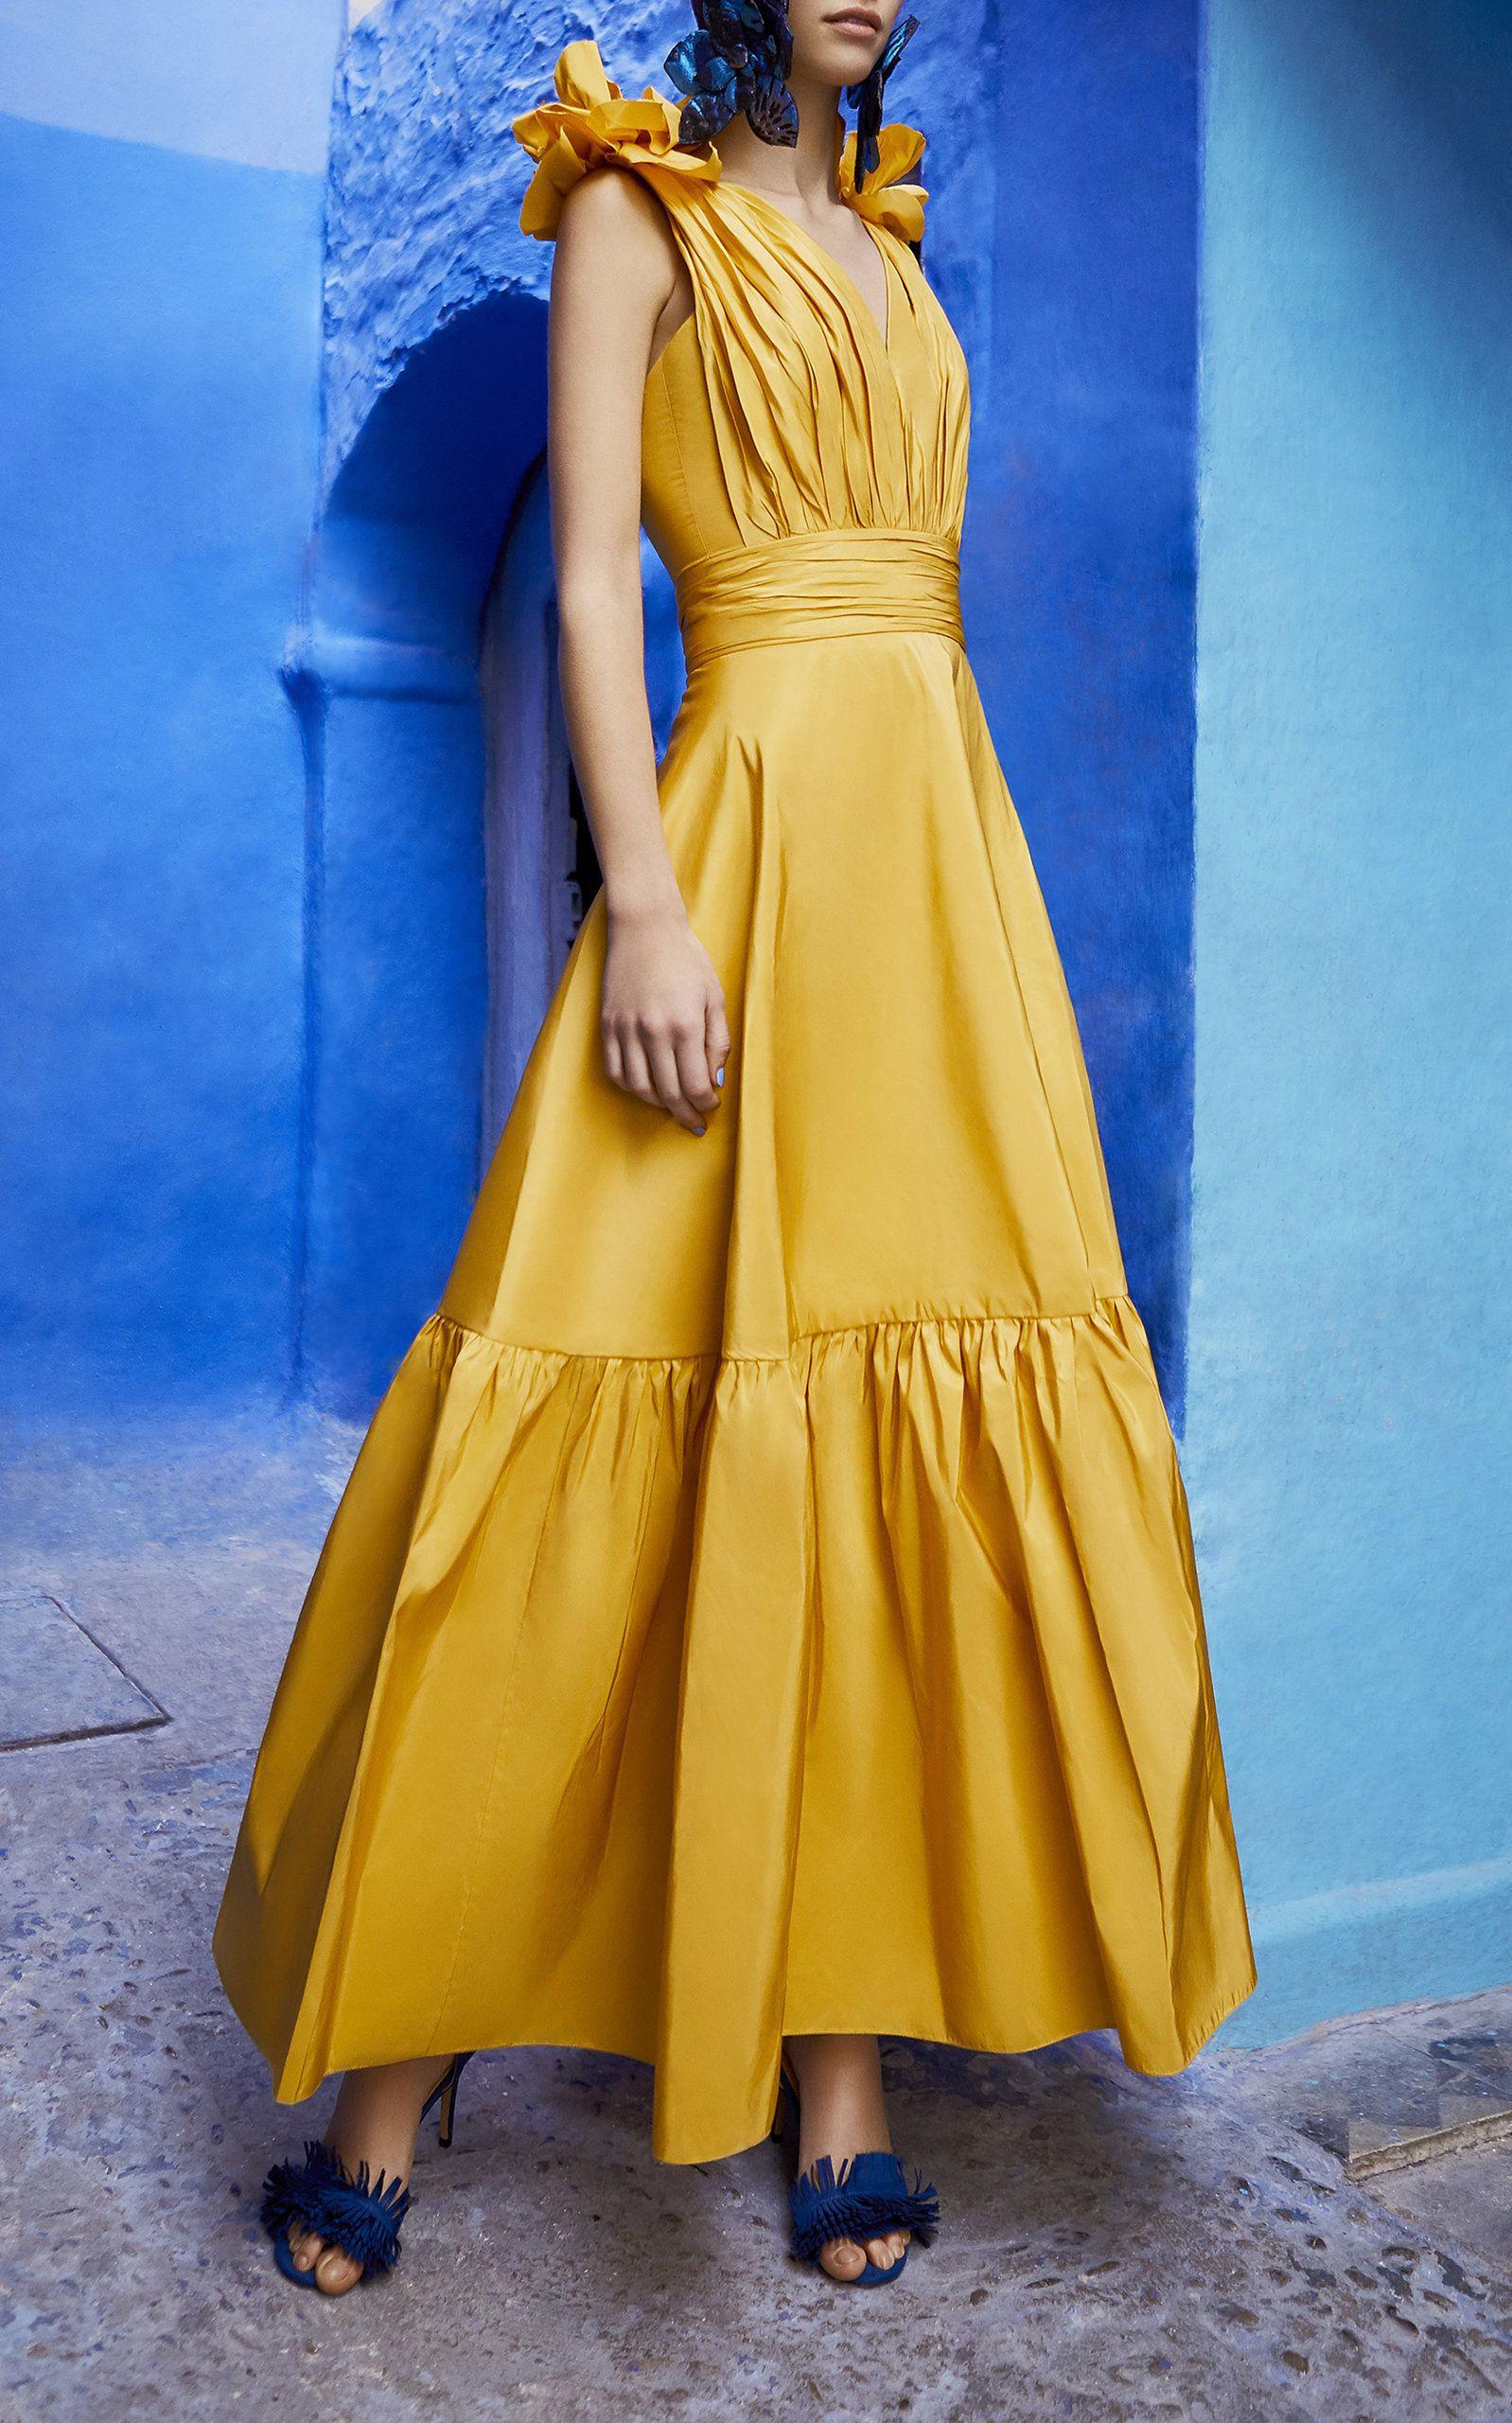 Yellow Sunflower Dress By Bambah For Preorder On Moda Operandi Evening Dress Fashion Dresses Sunflower Dress [ 2560 x 1598 Pixel ]